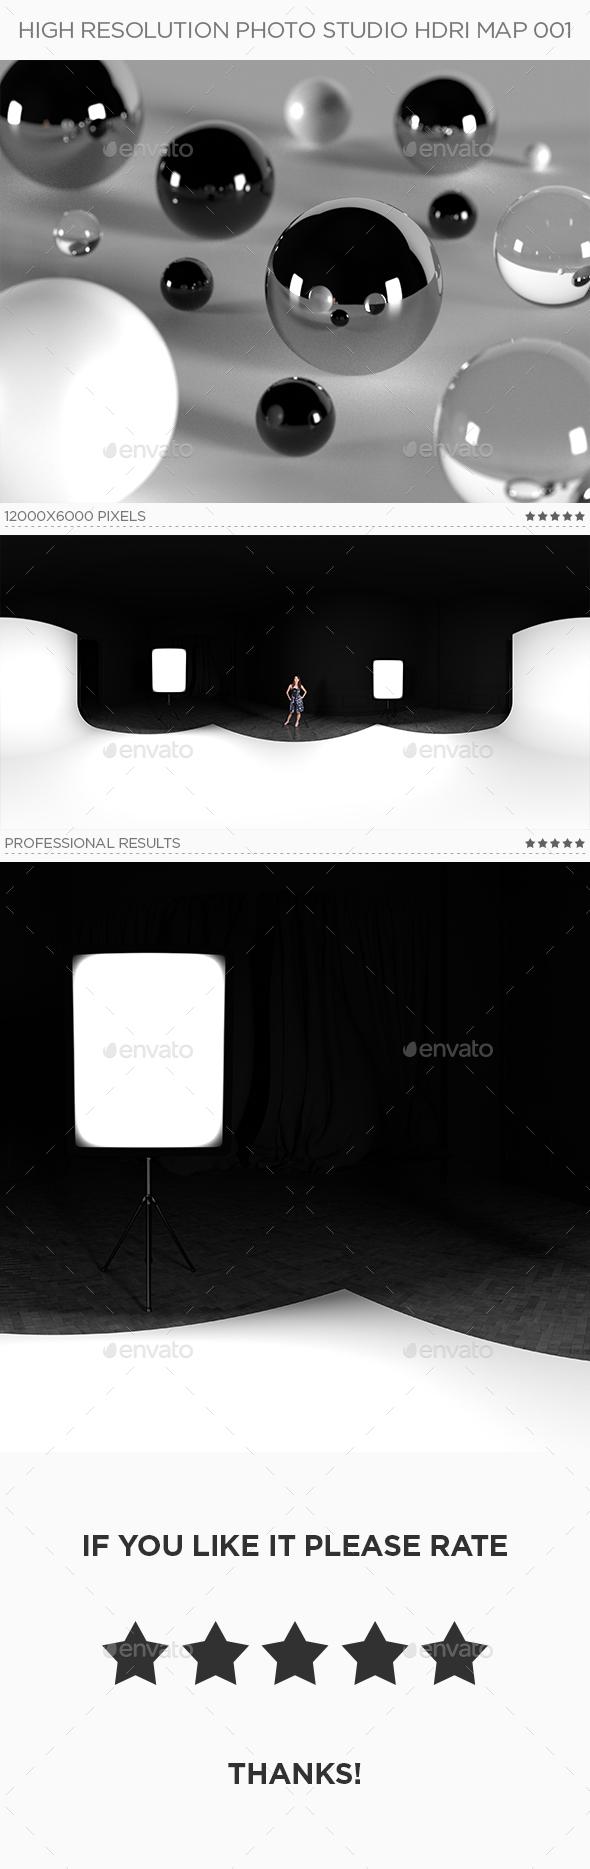 High Resolution Photo Studio HDRi Map 001 - 3DOcean Item for Sale